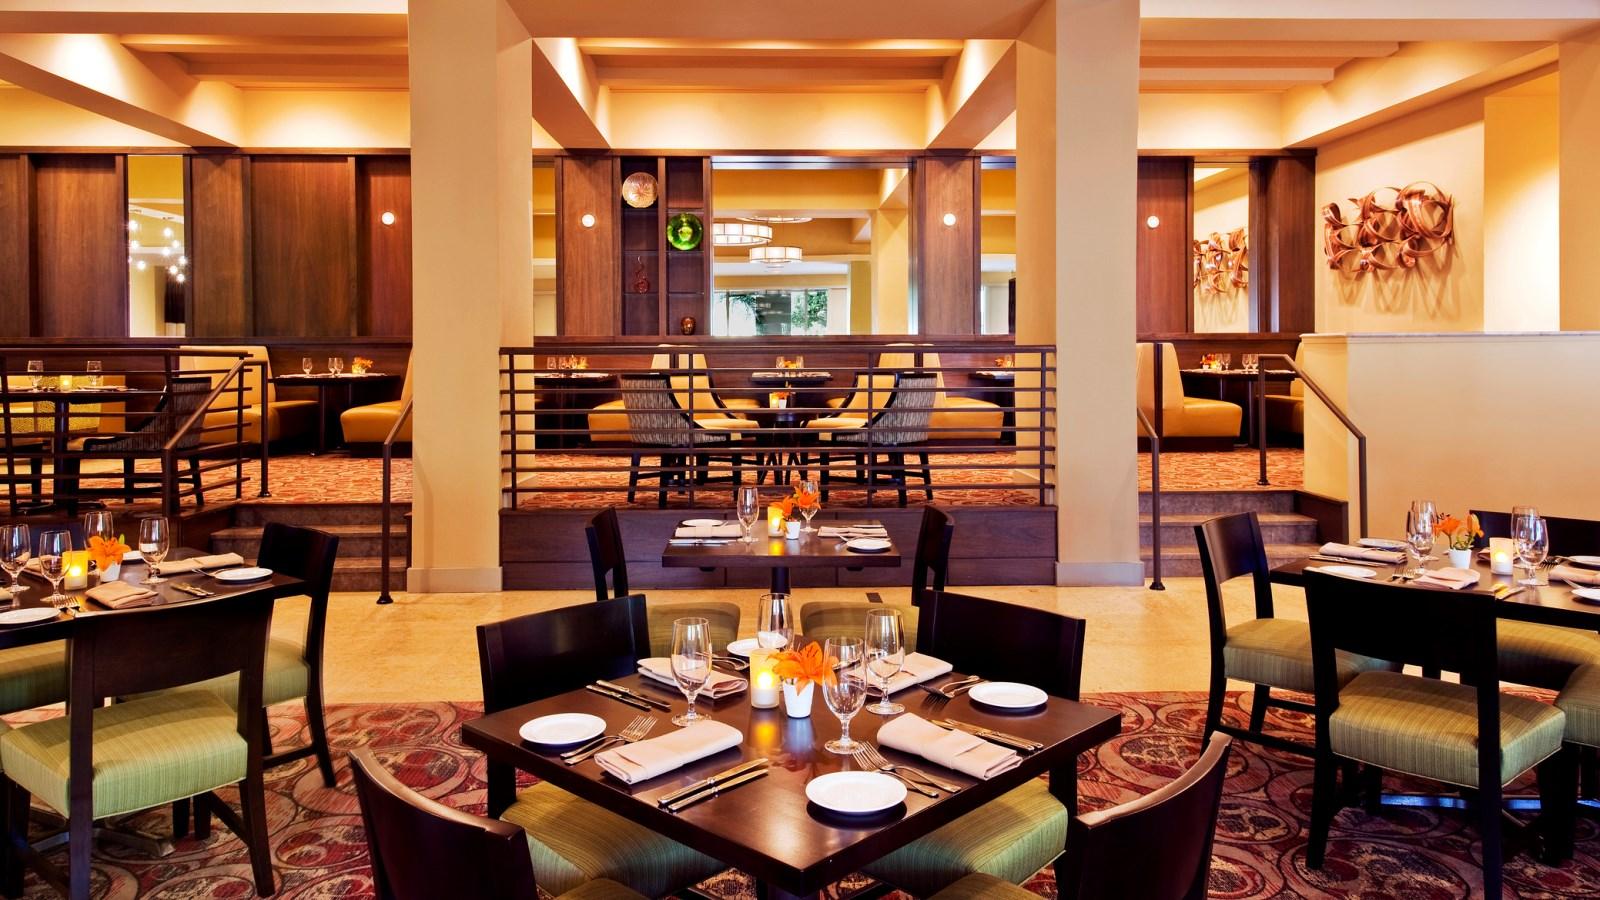 SEO Services For A Restaurant In Karachi